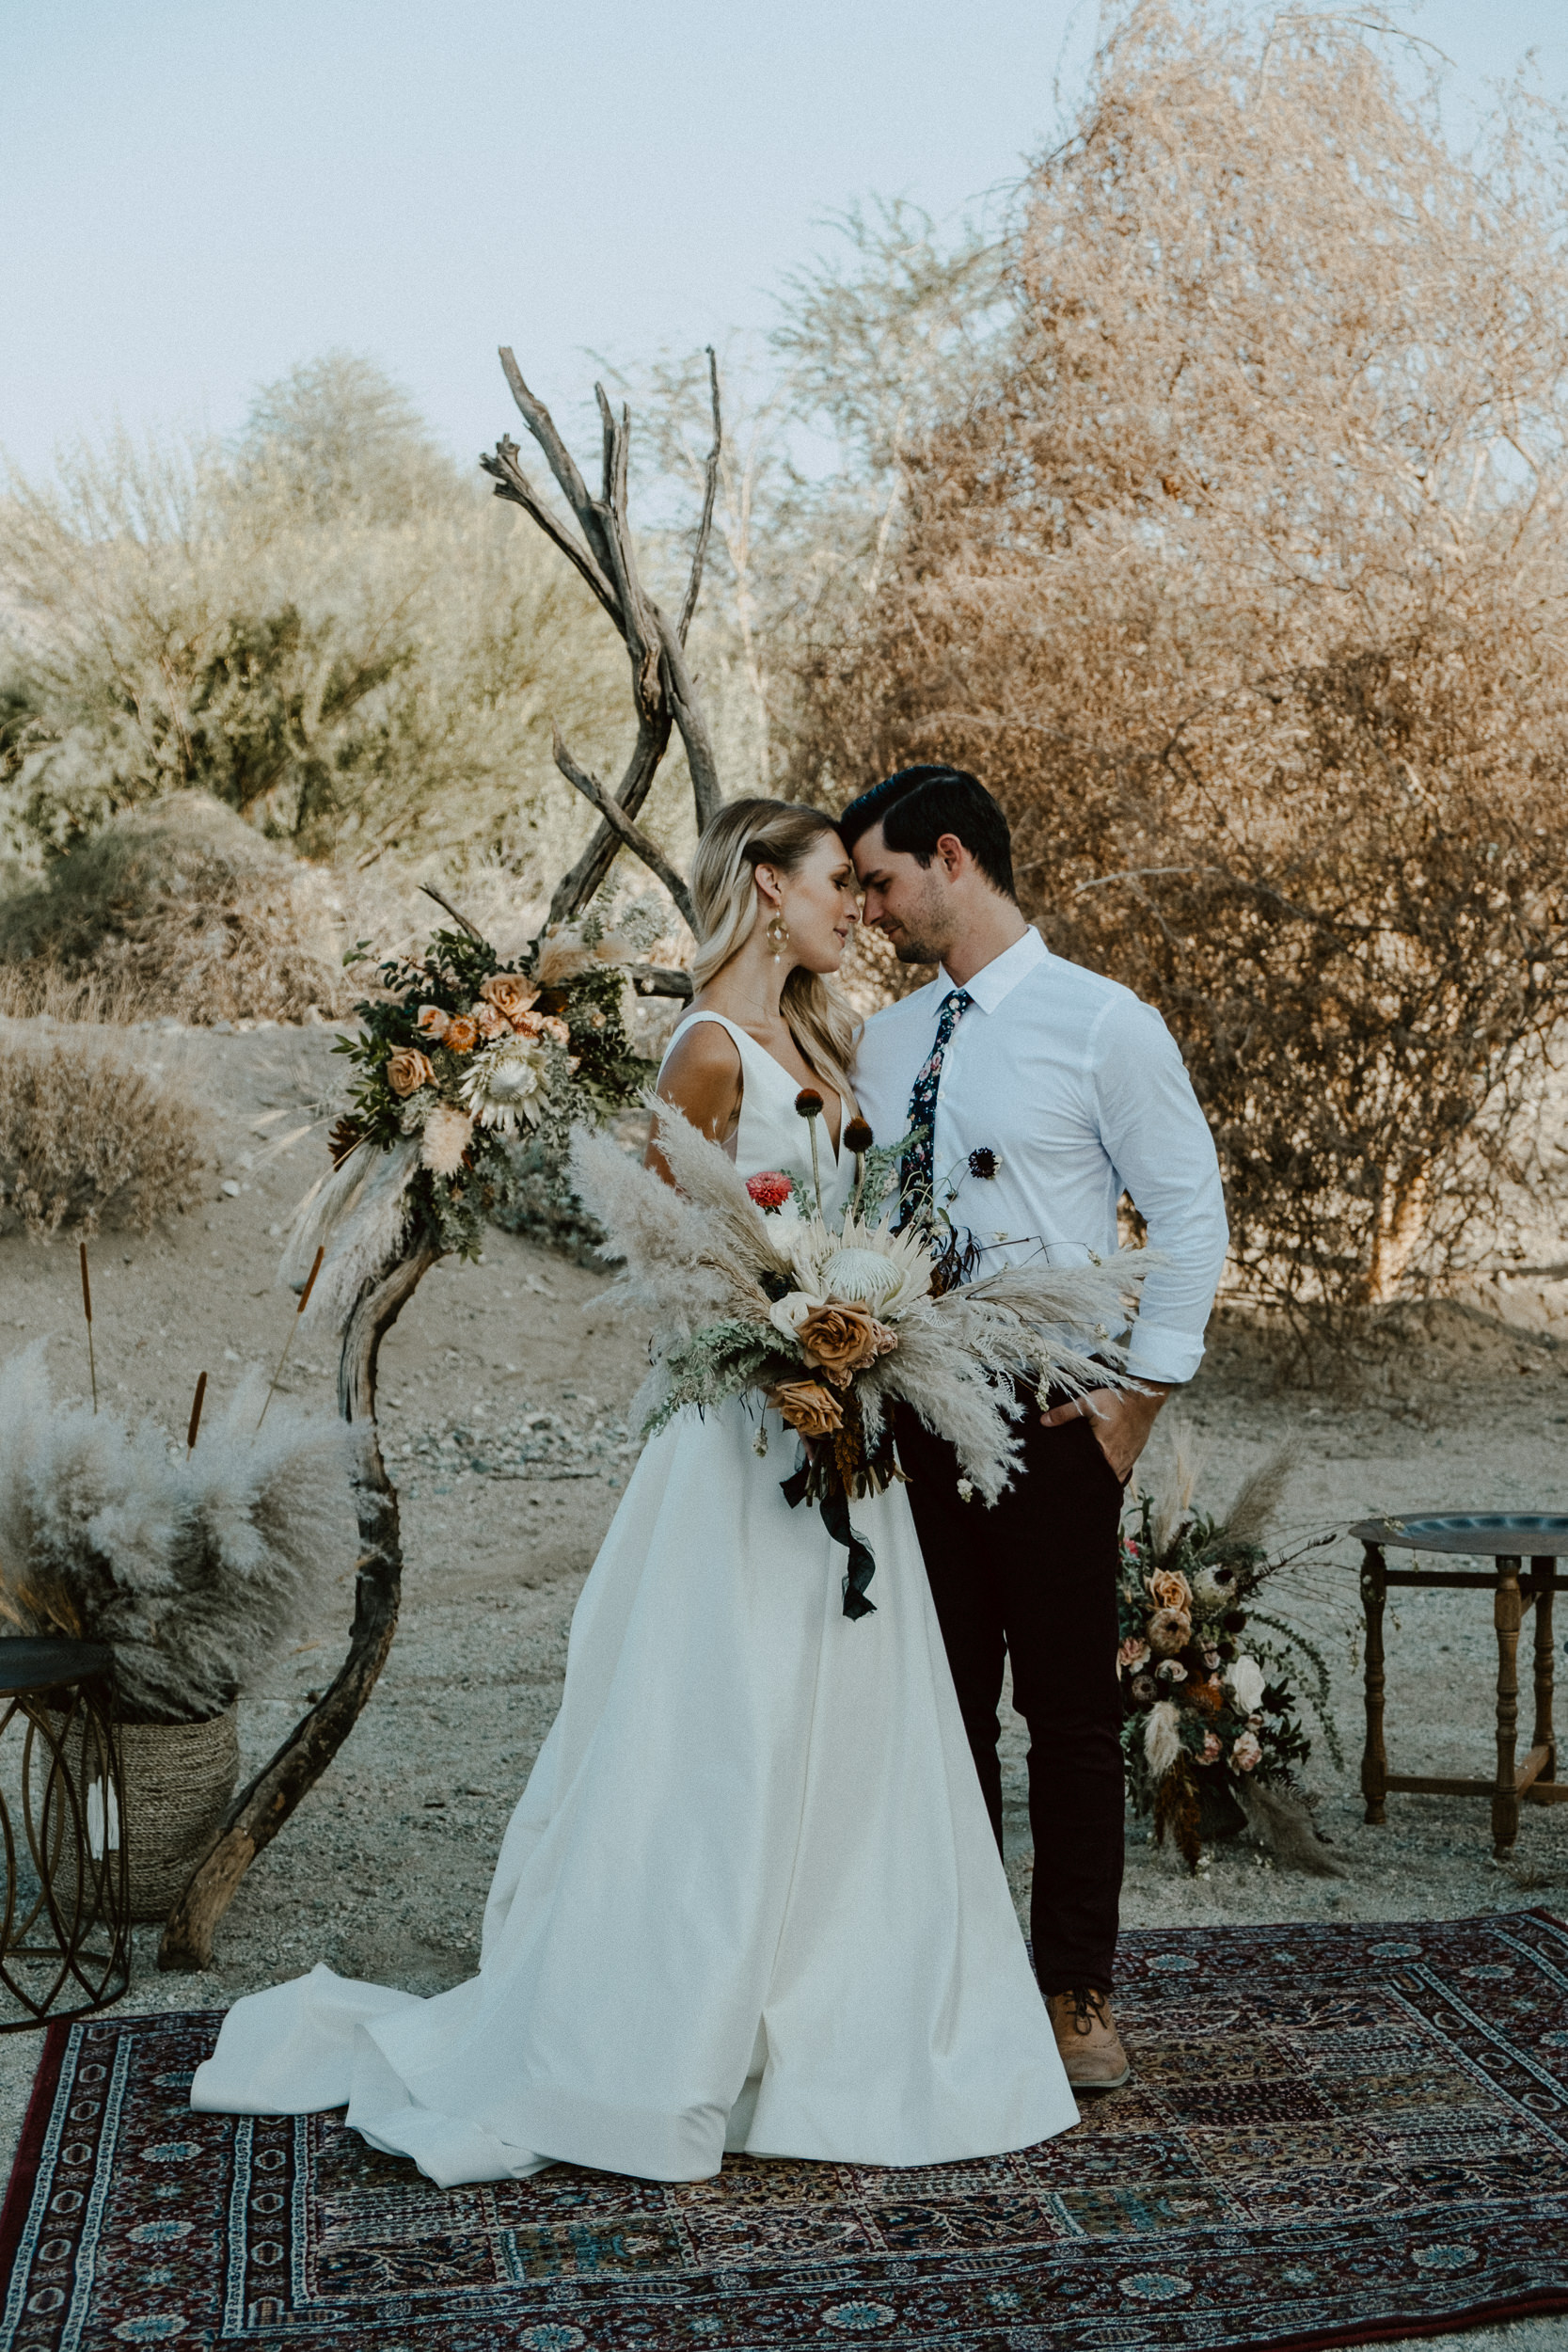 sChelsie + Chris - The Desert Shootout Wedding Romantics at The Living Desert-2.jpg